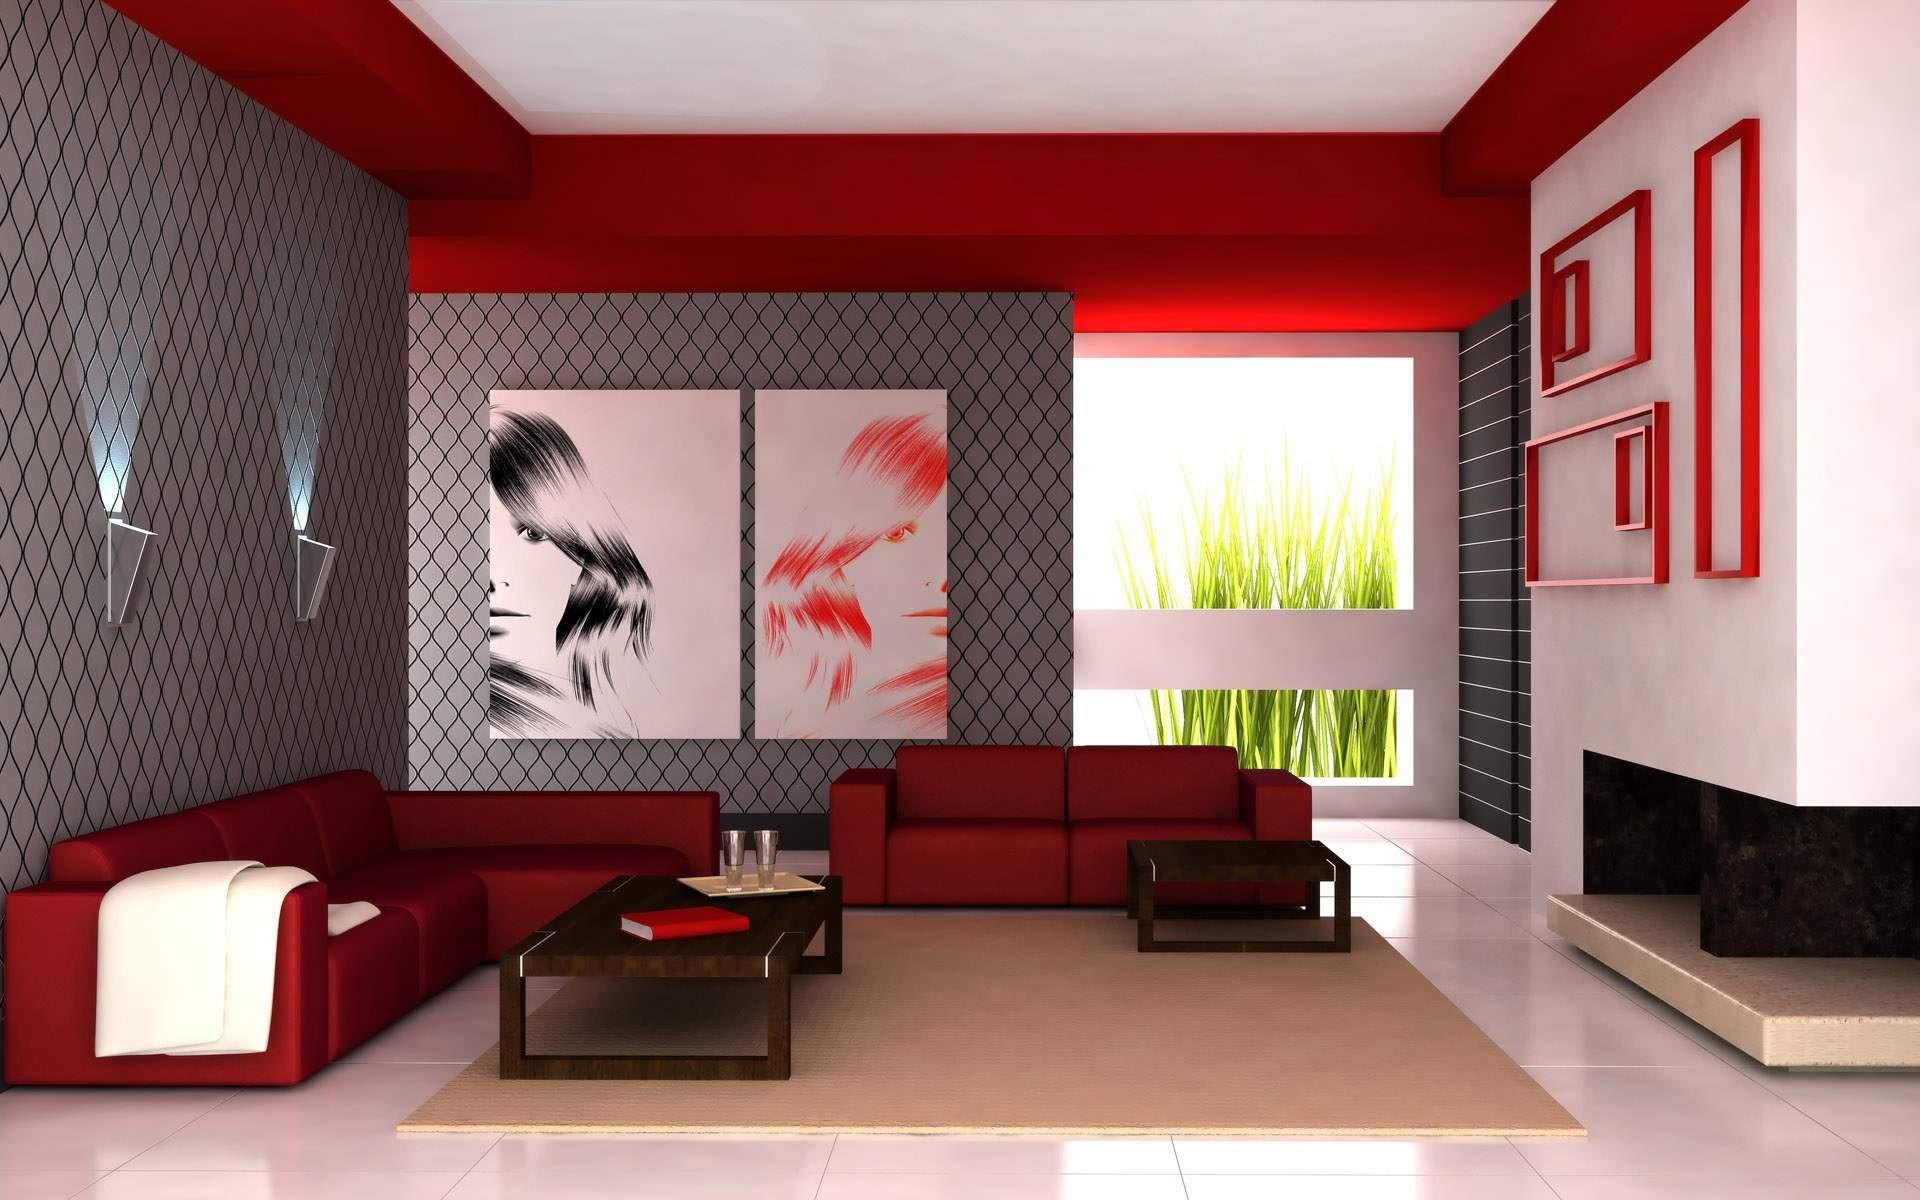 Living Room Apartment Red White, Red White Living Room